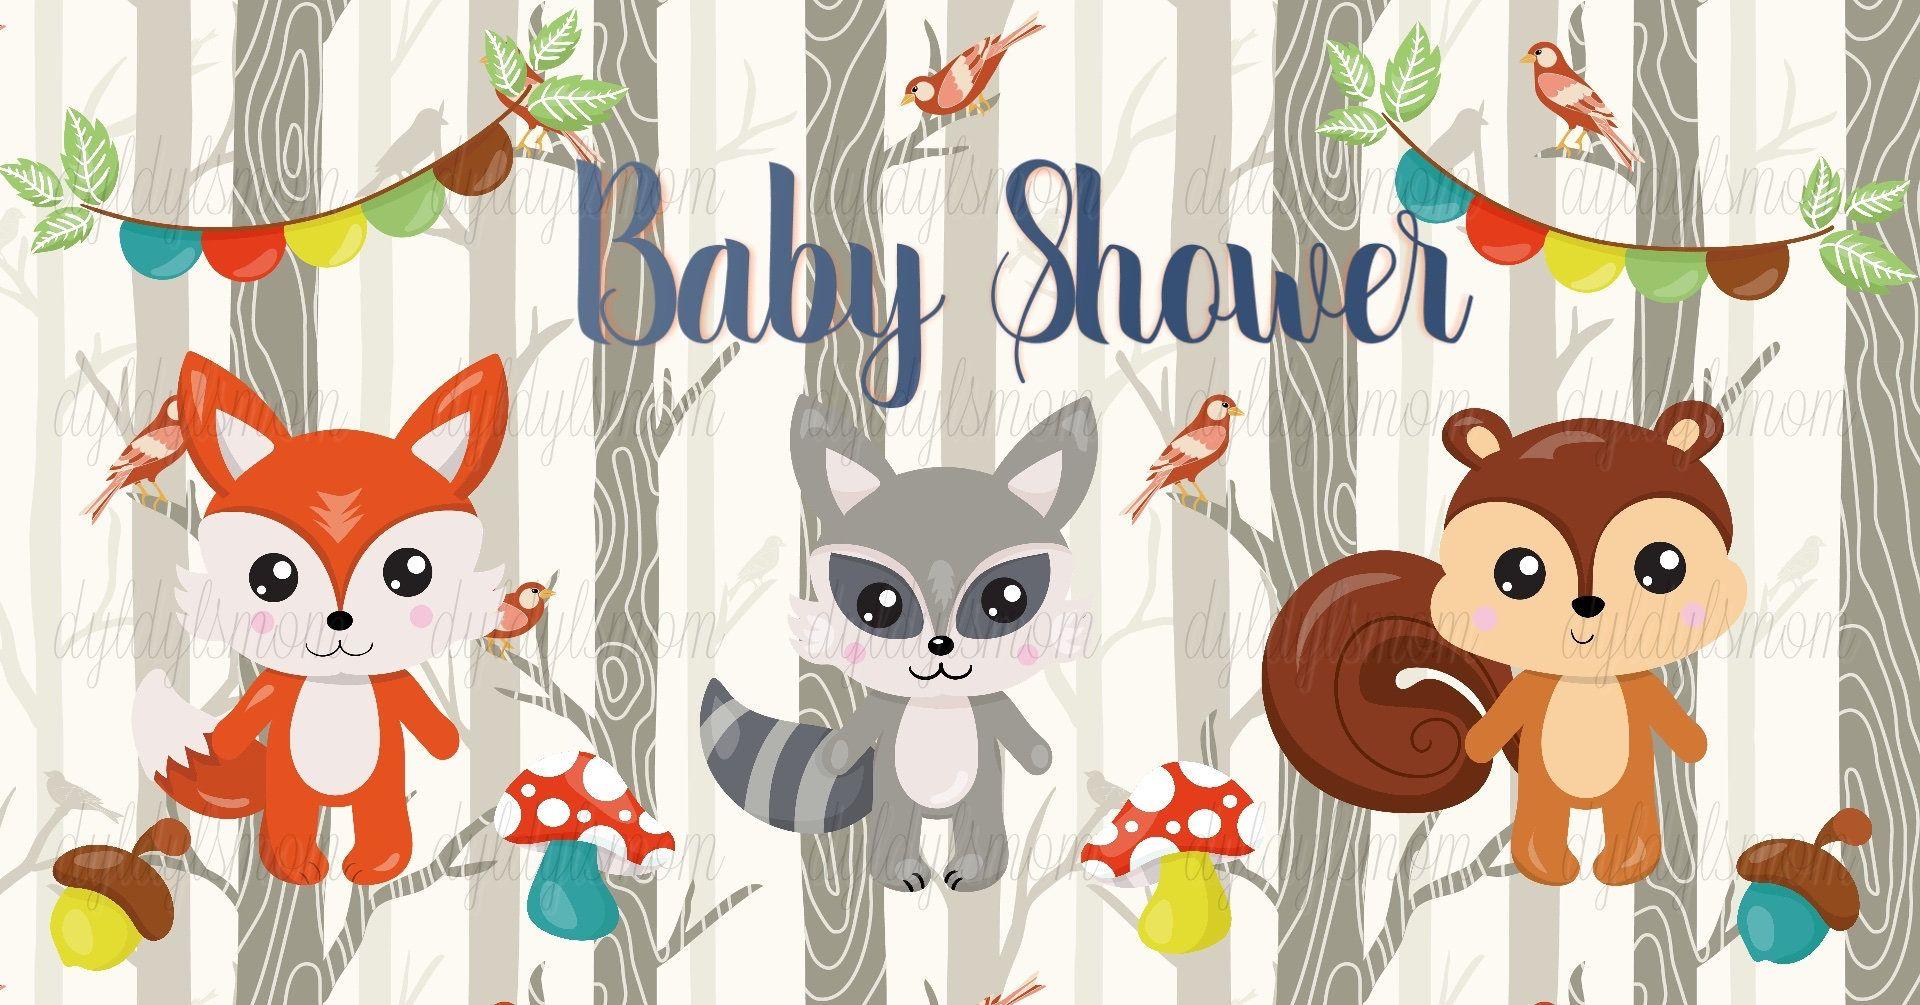 Woodland Creatures Baby Shower Facebook Event Cover Photo In 2020 Woodland Creatures Baby Shower Baby Shower Facebook Facebook Event